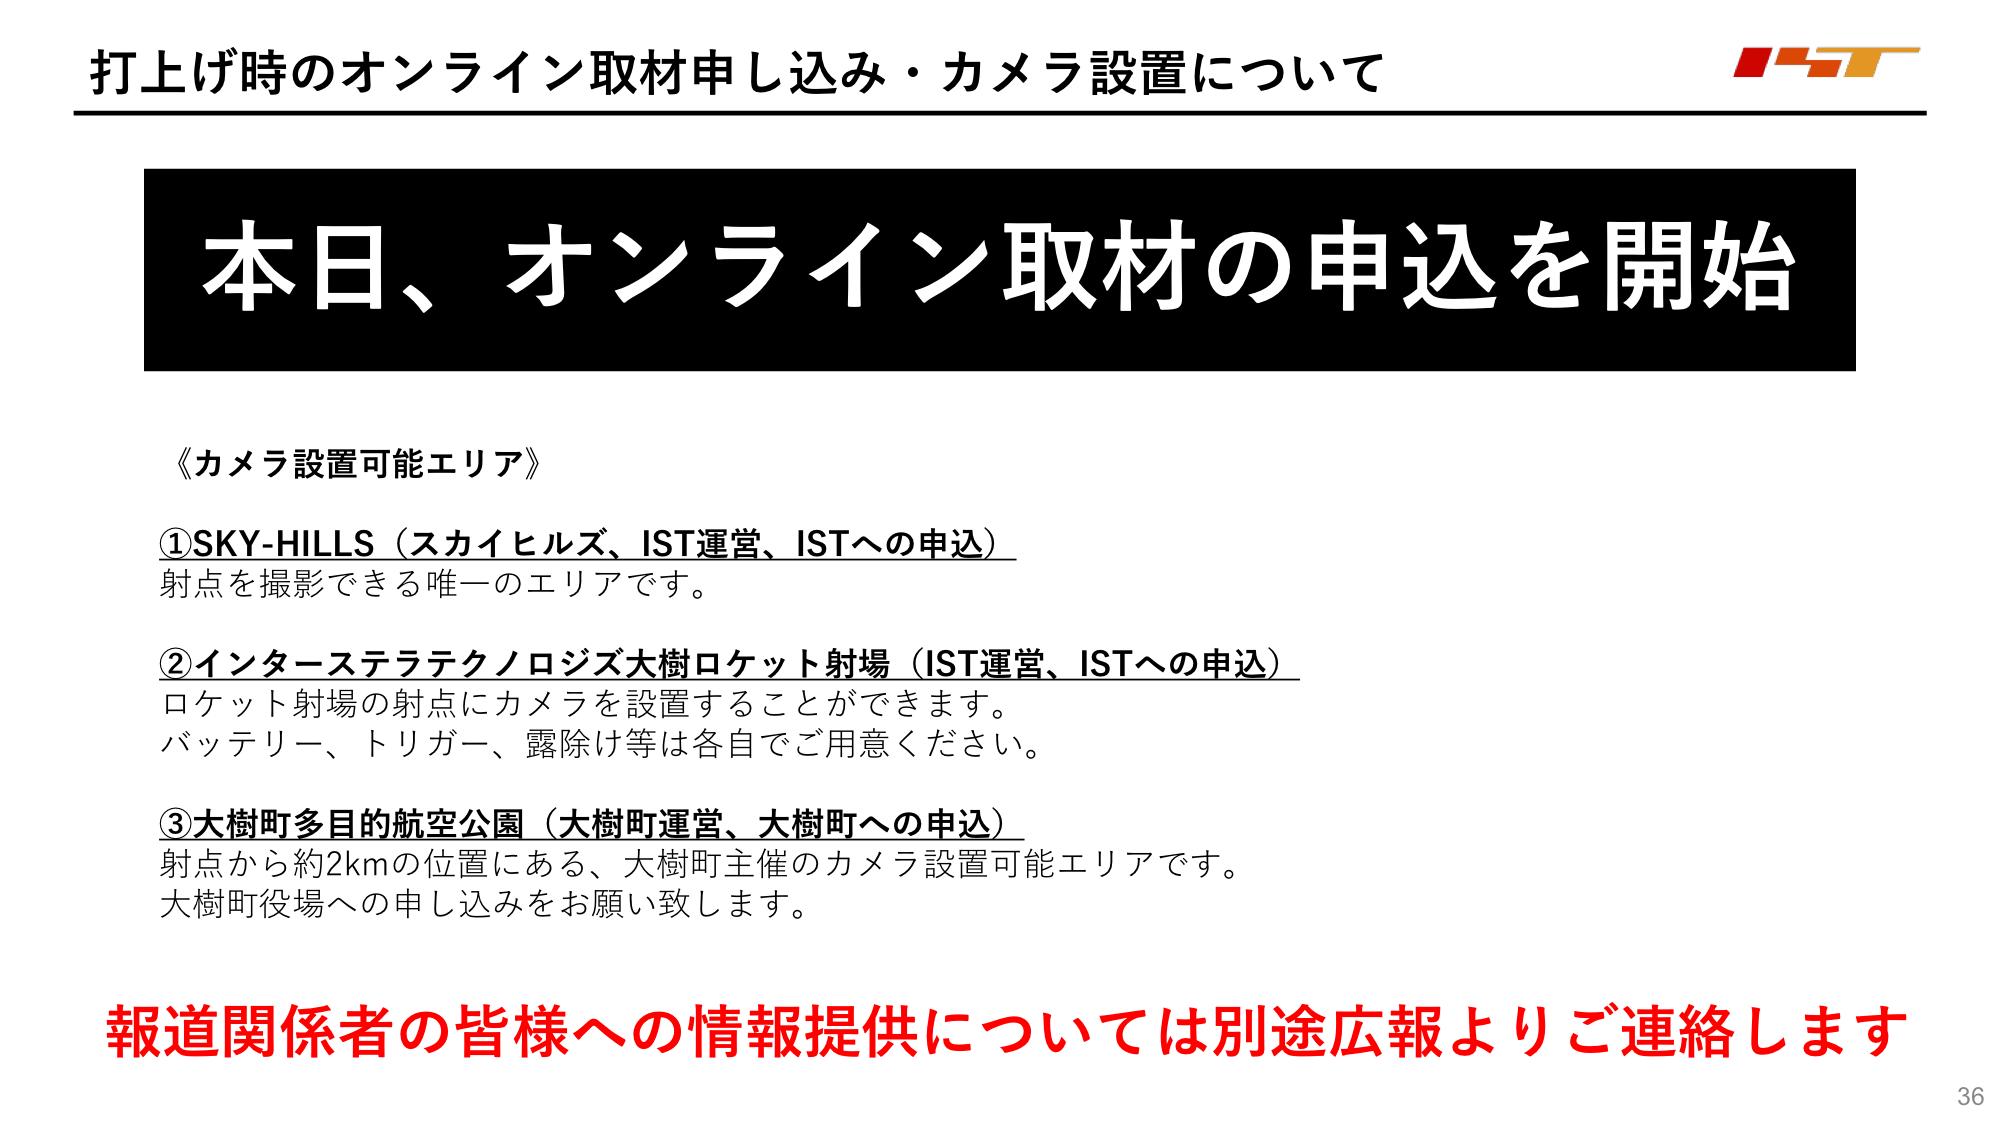 f:id:Imamura:20200603233050p:plain